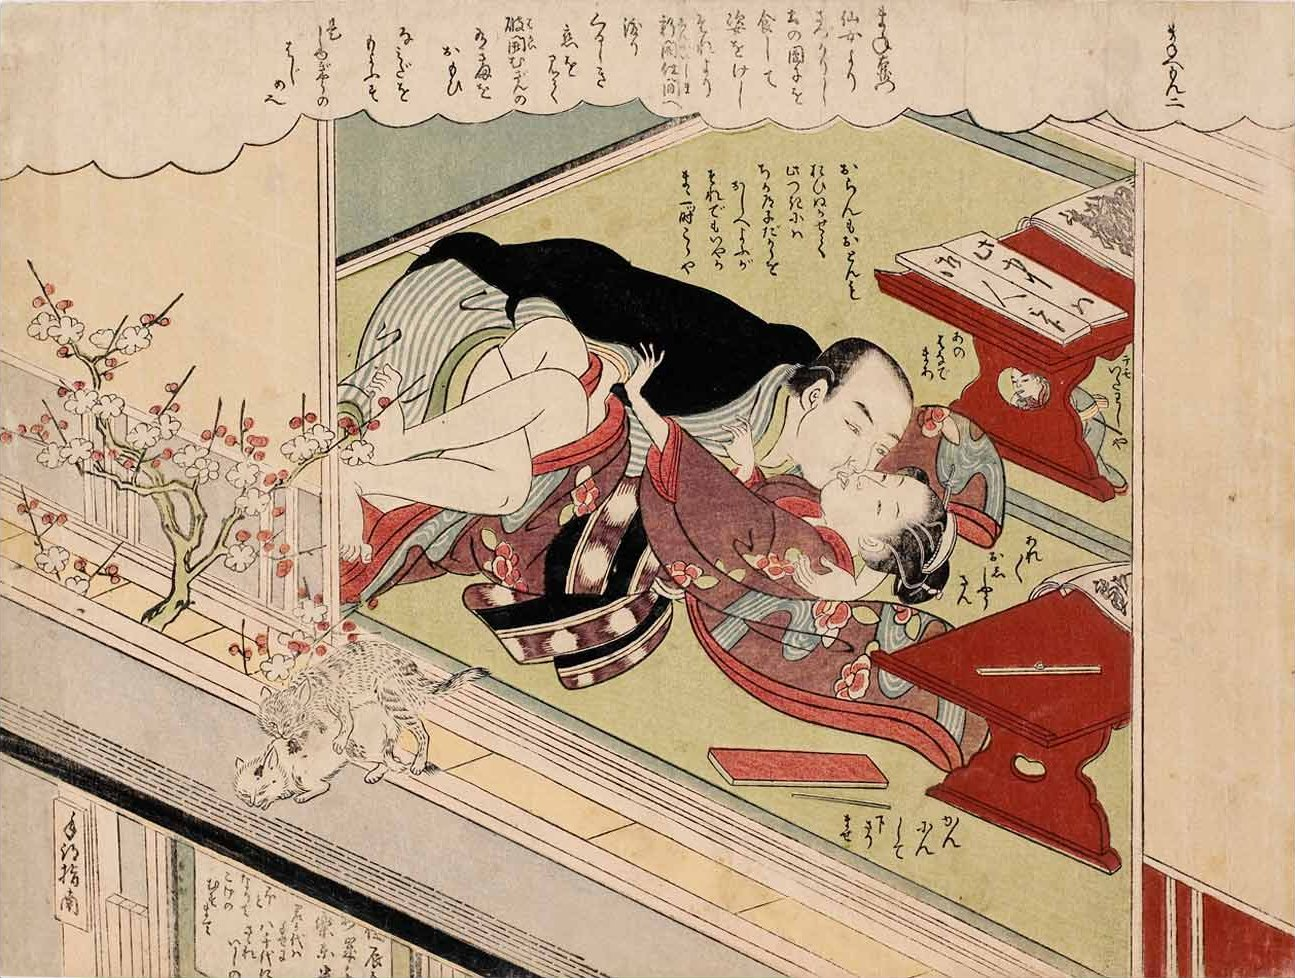 Japanese sex book